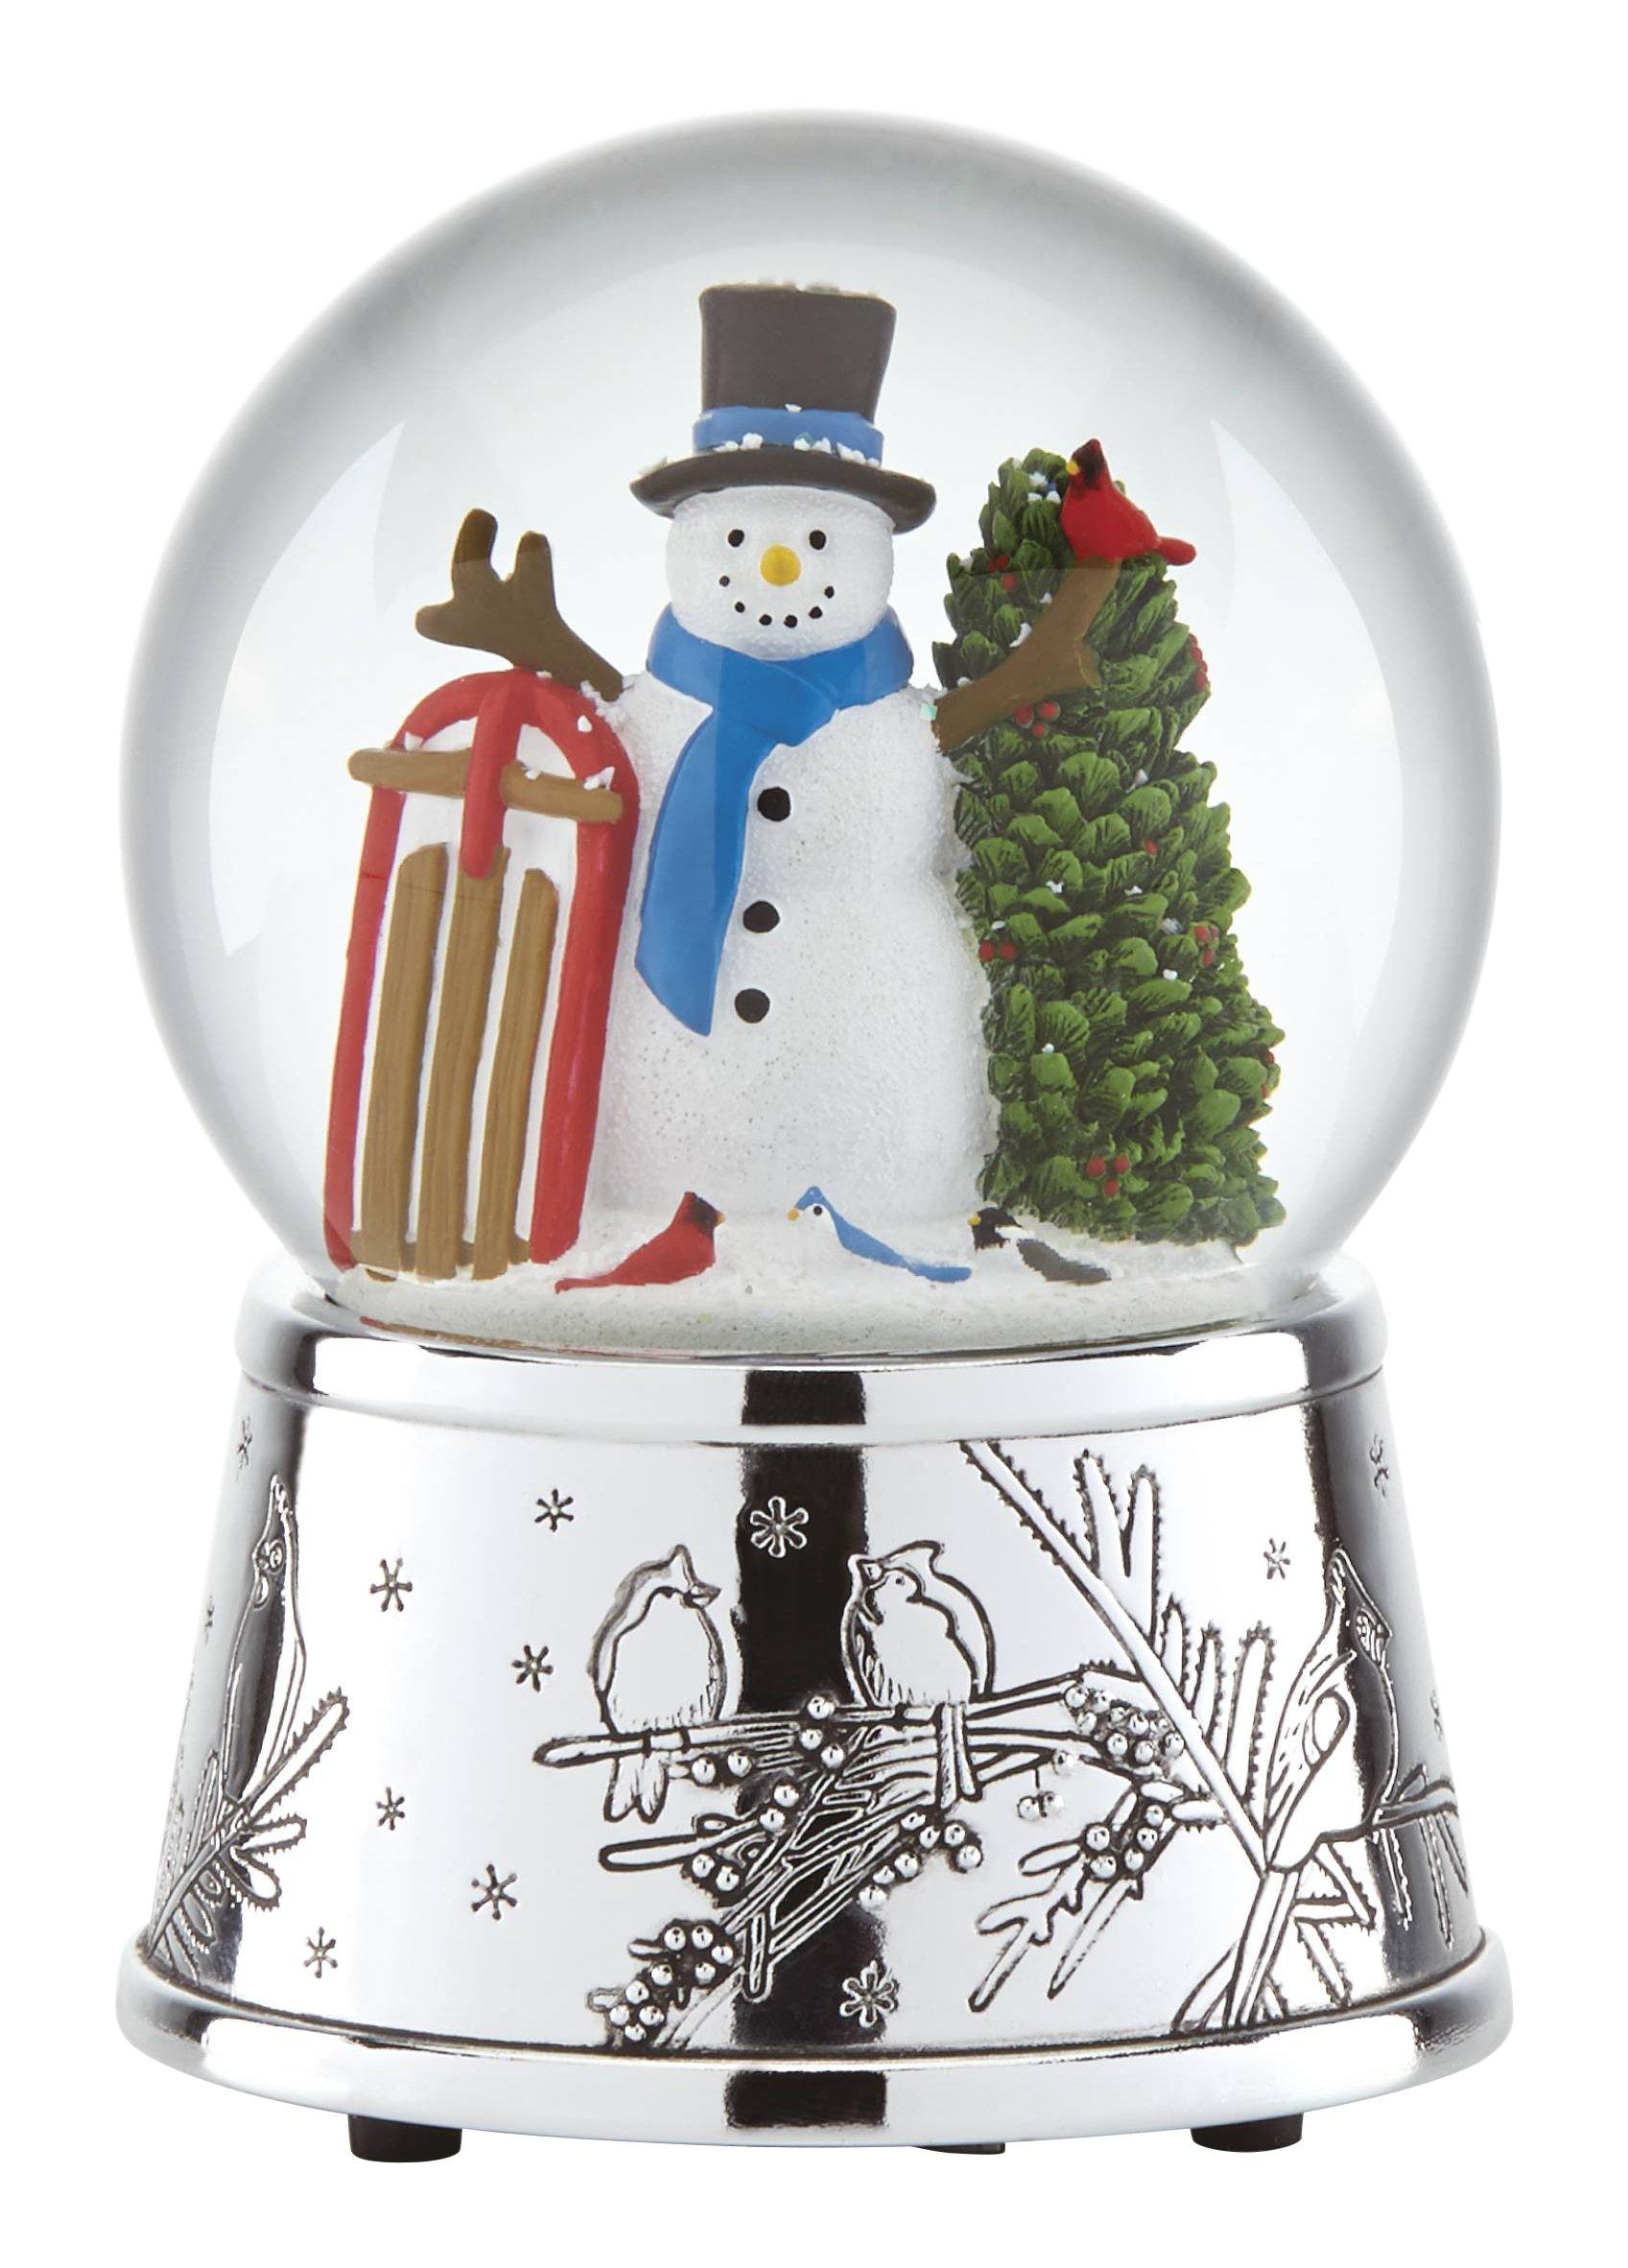 Reed & Barton Snowmen & Sleigh - Snowglobe by Reed & Barton